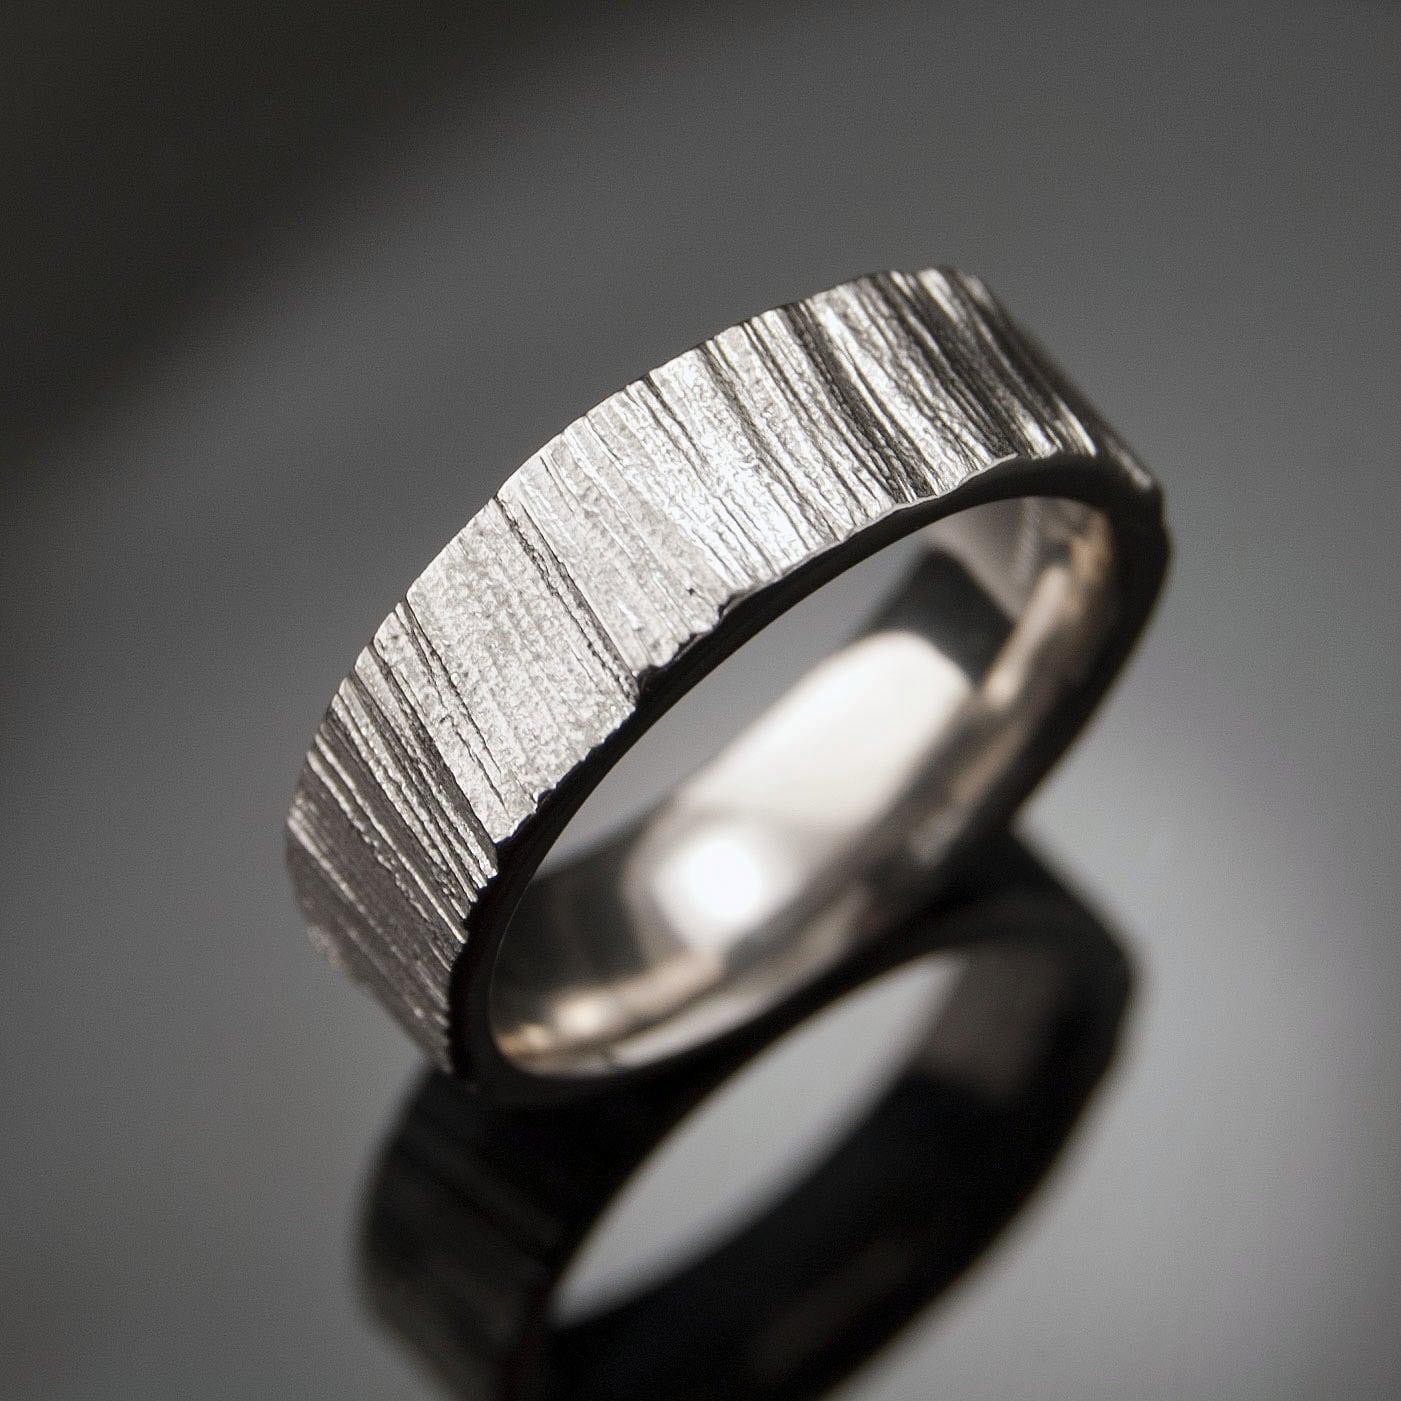 Saw Cut Wedding Band Ring Textured Palladium Ring Unisex